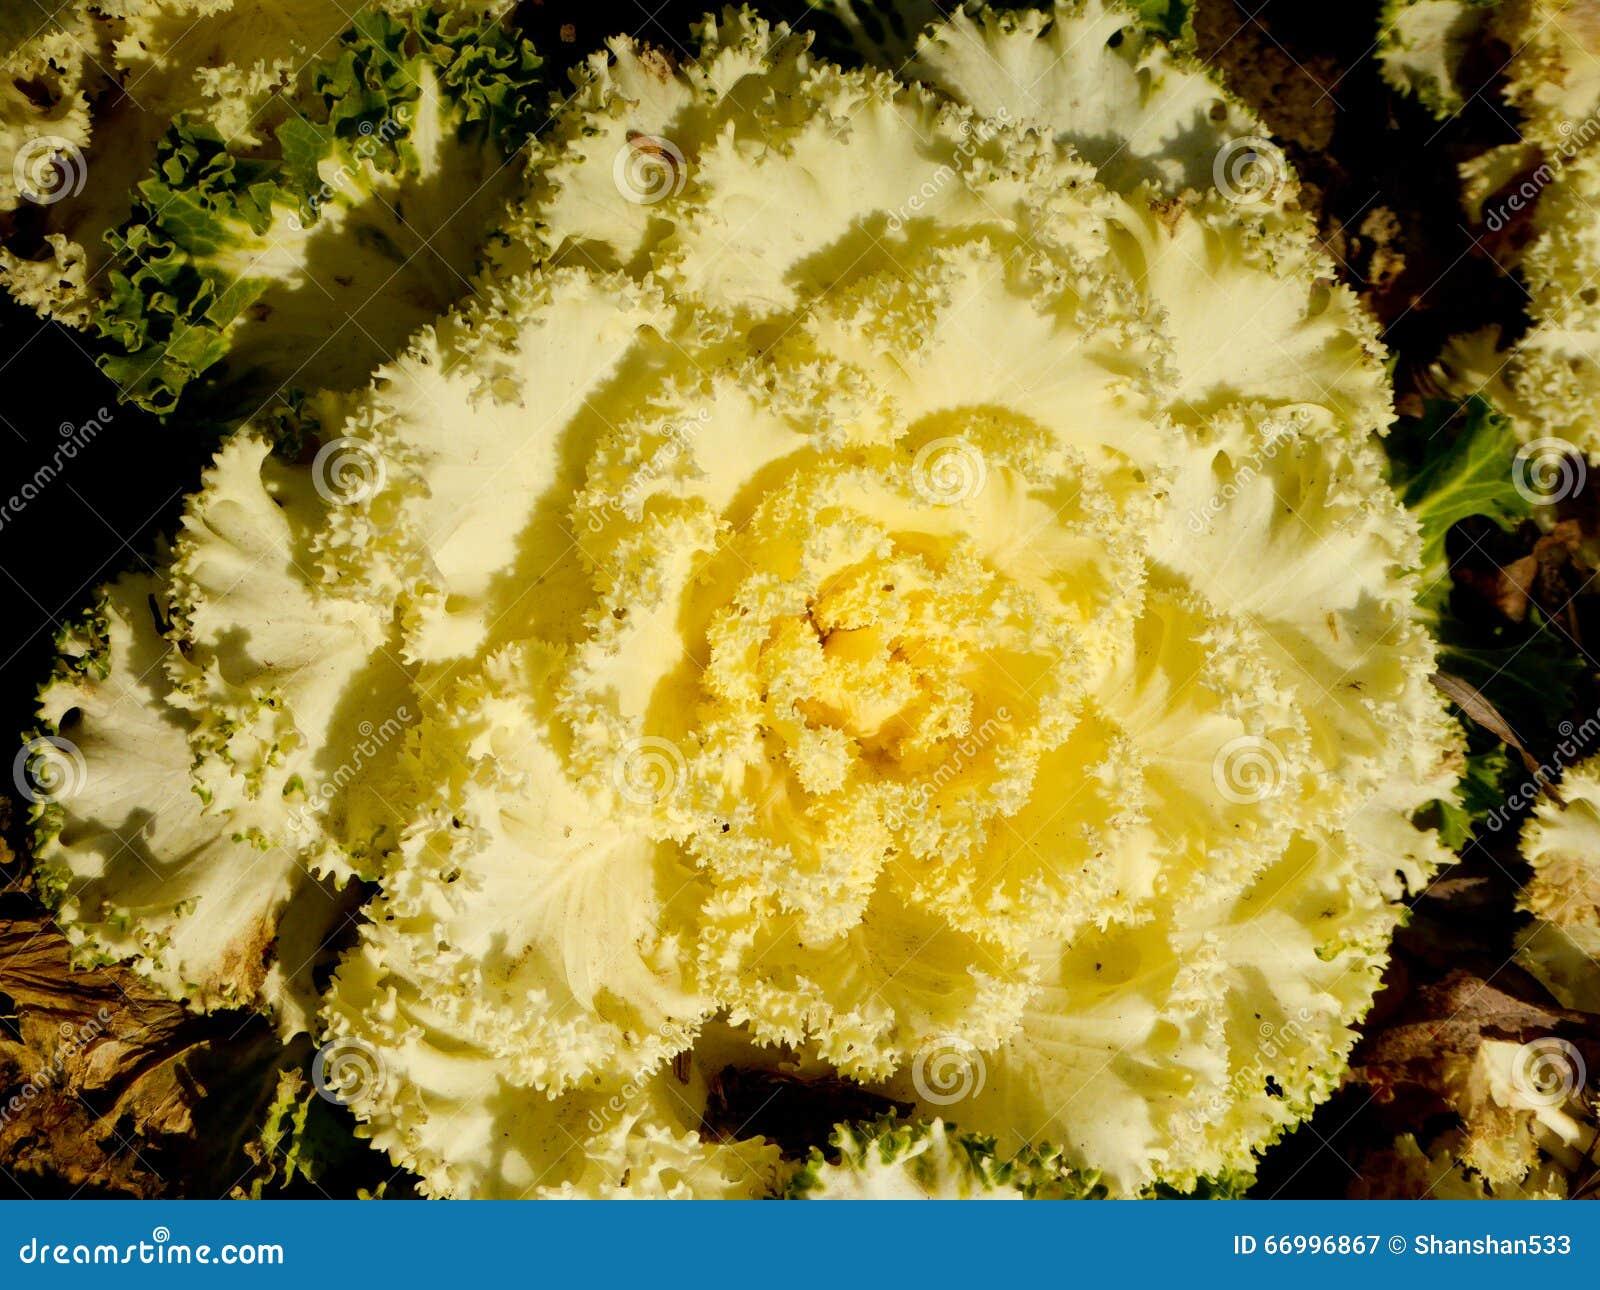 Kale blooming in a garden